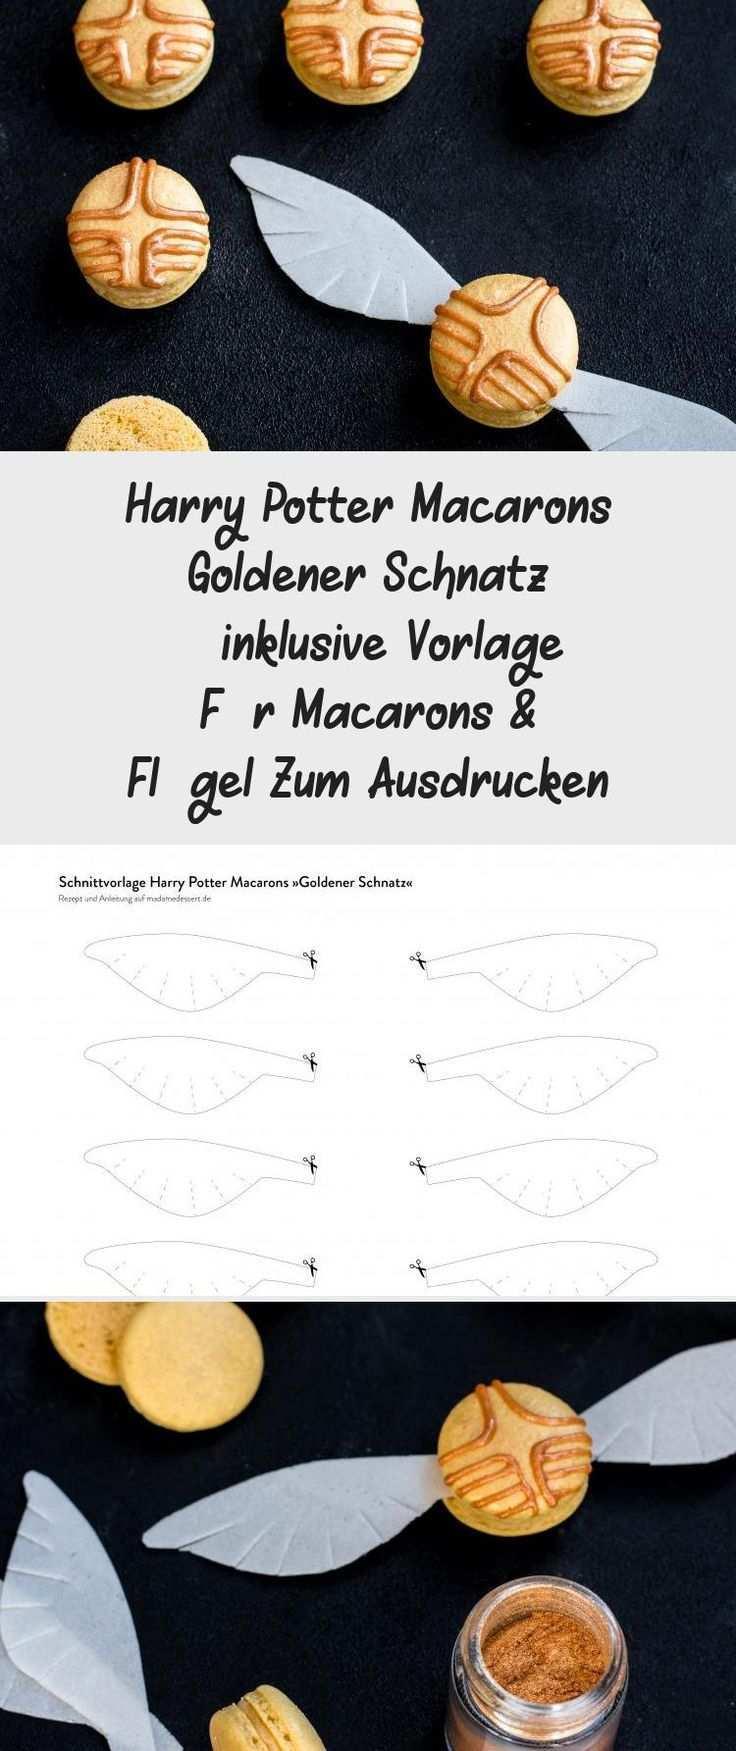 Anleitung Rezept Harry Potter Macarons Goldener Schnatz Inklusive Vorlage Fur Macarons Flugel Zum Ausdrucken Madame D Macarons Goldener Schnatz Schnatz